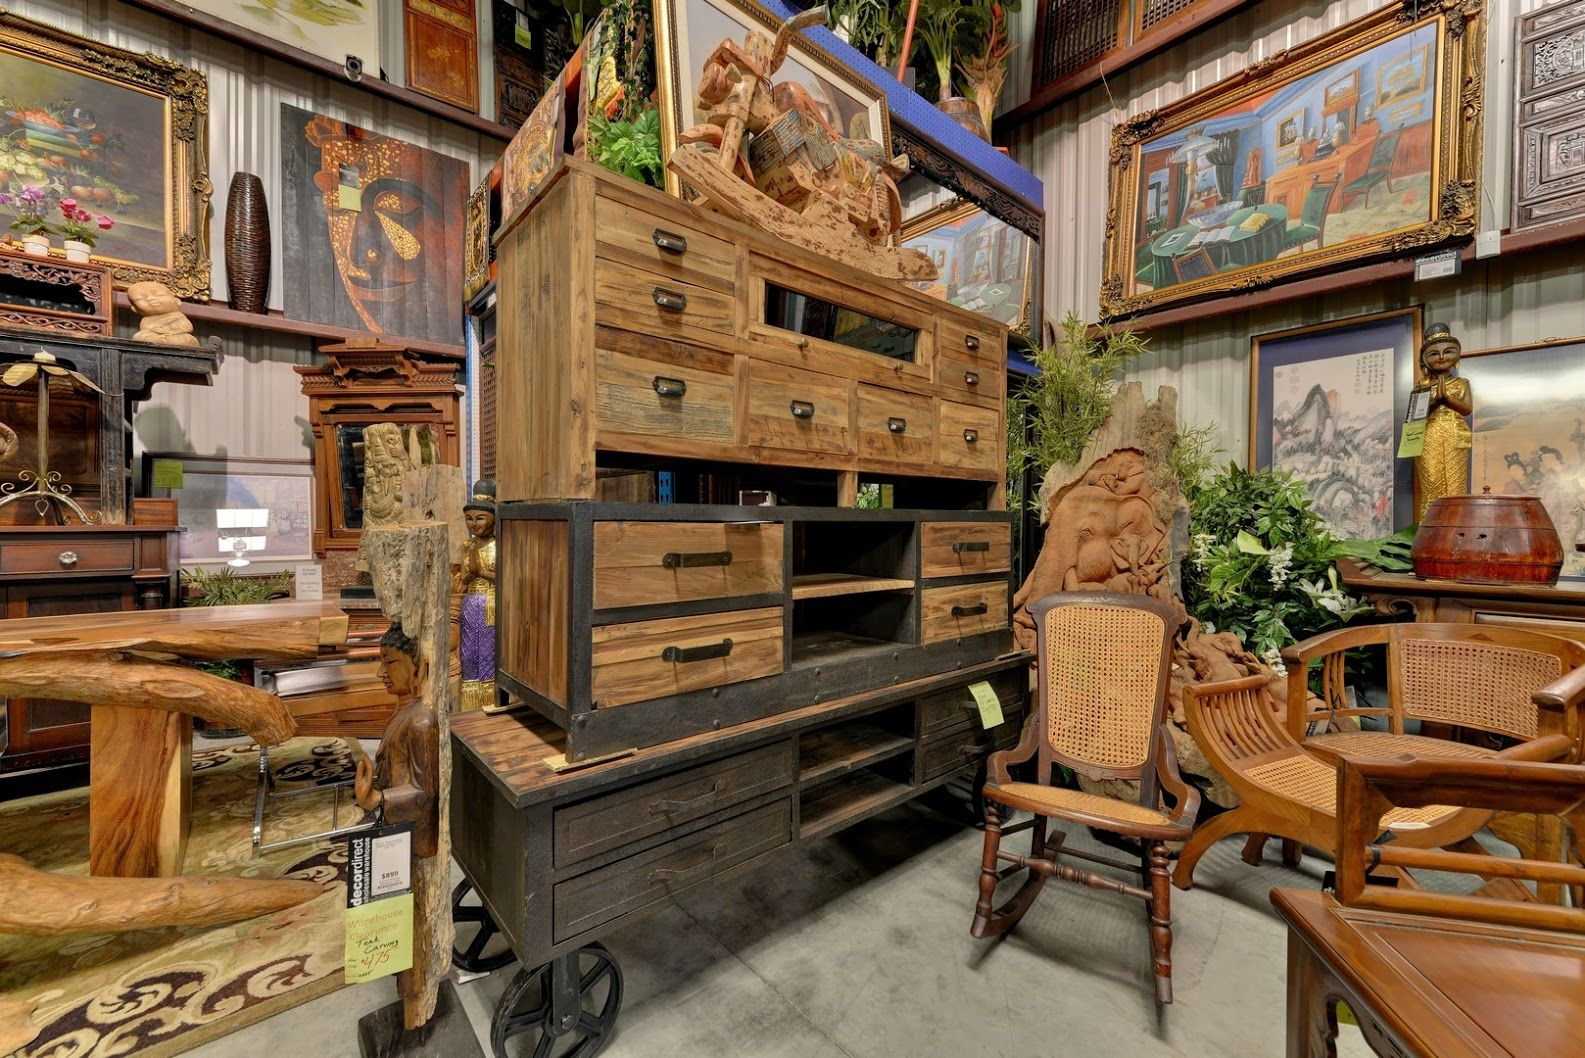 Slab Artisan Wood Furniture Decor Direct Sarasota Fl